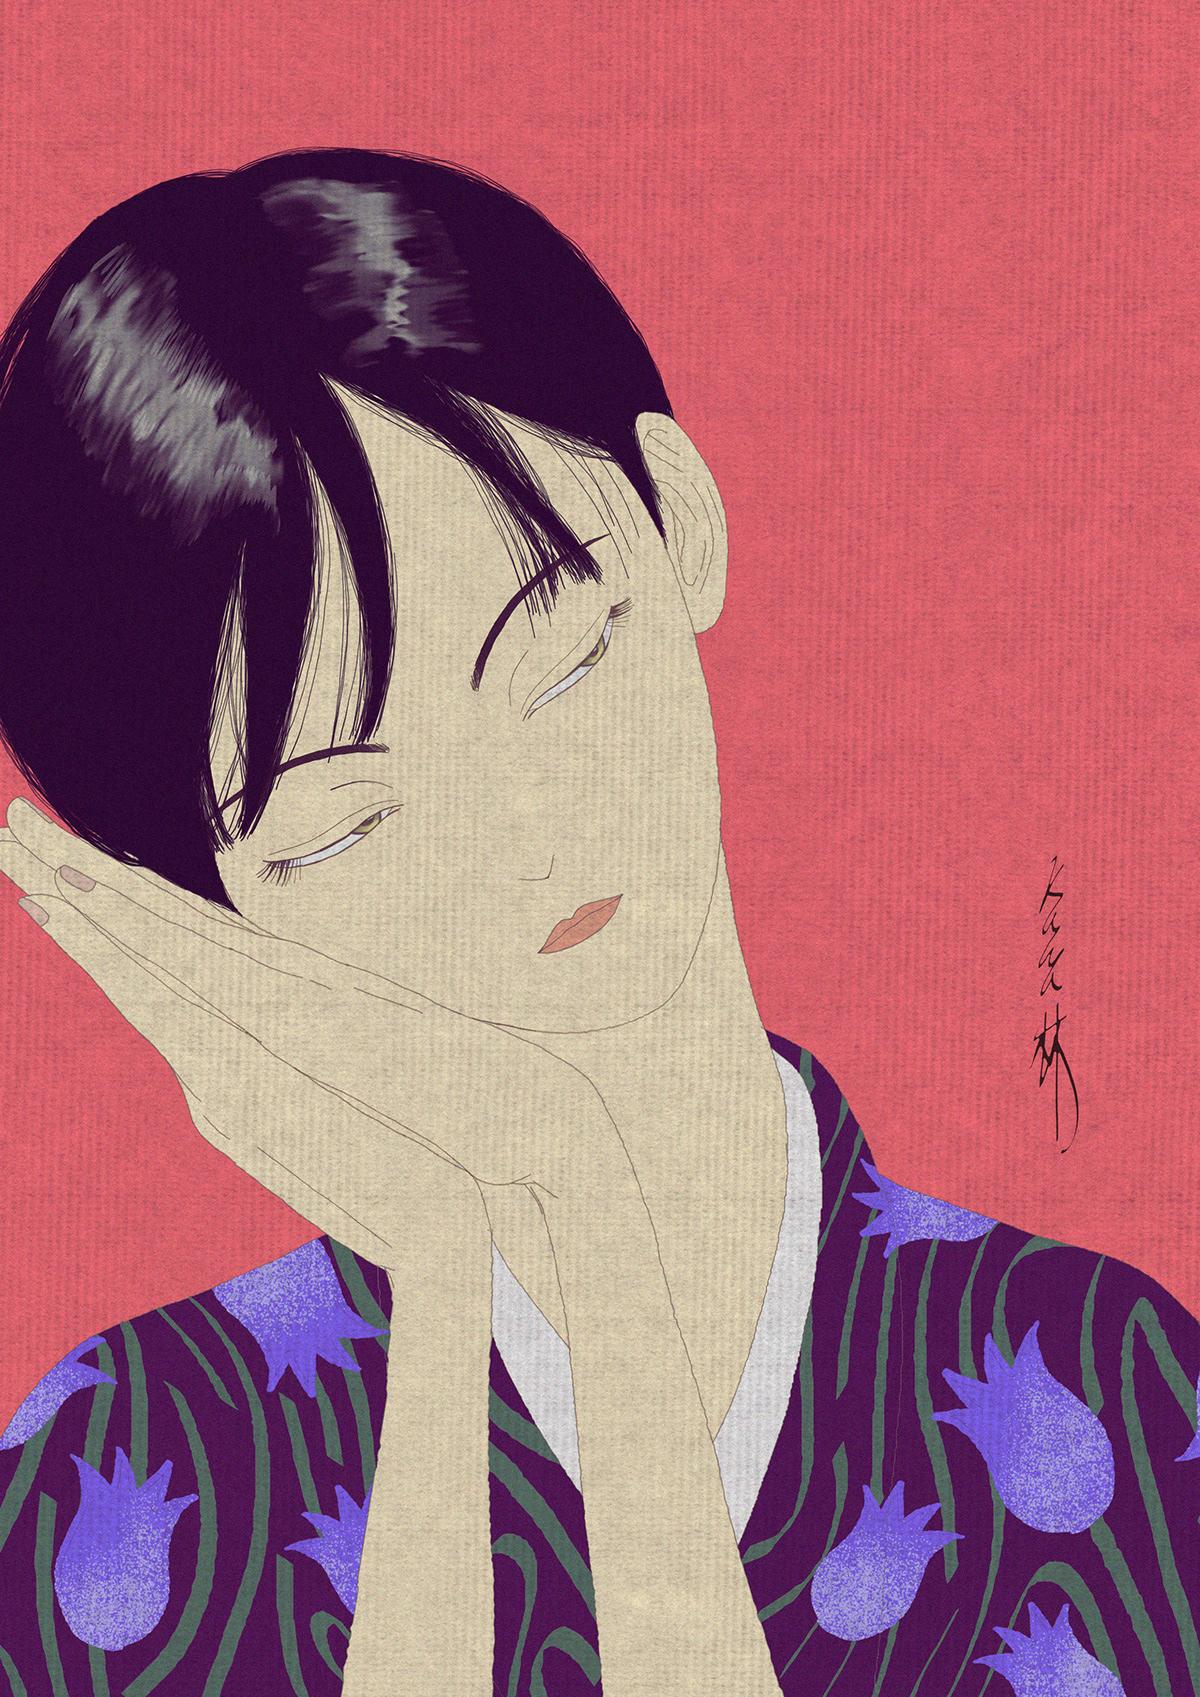 oriental characterdesign figuredrawing pendrawing digitalart coloring DIGITALDRAWING RetroArt Drawing  ILLUSTRATION